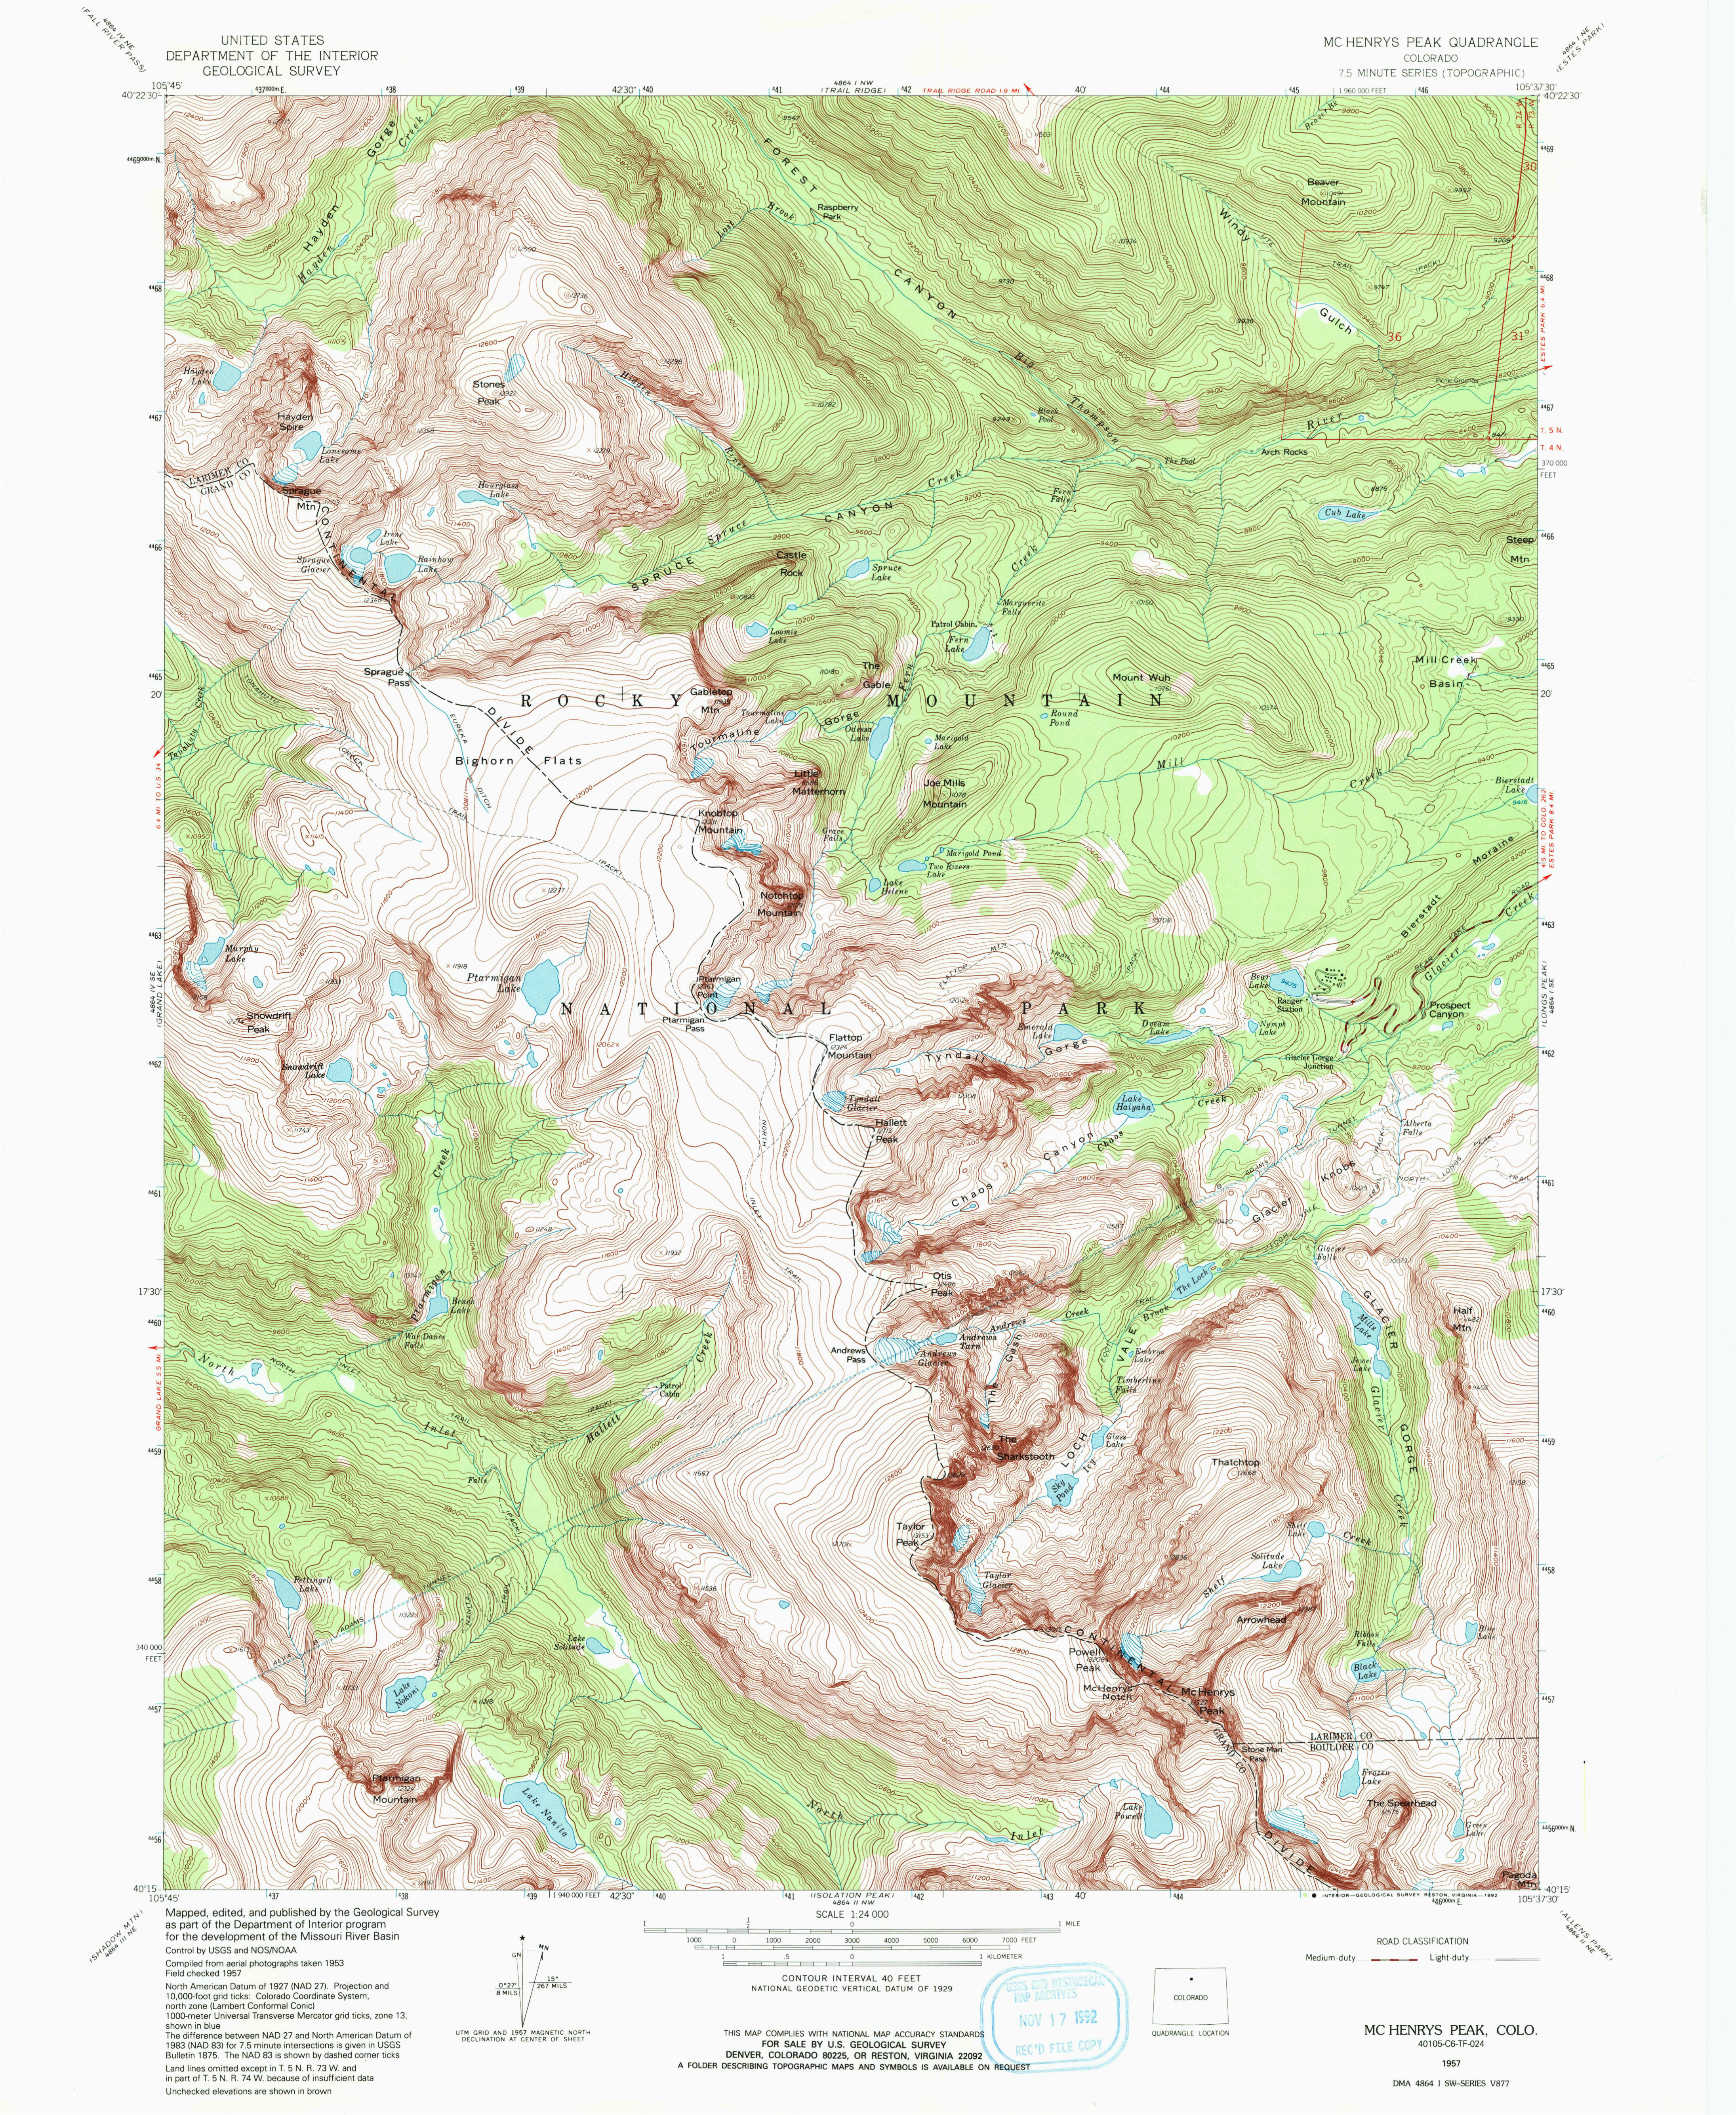 rocky mountain maps npmaps com just free maps period